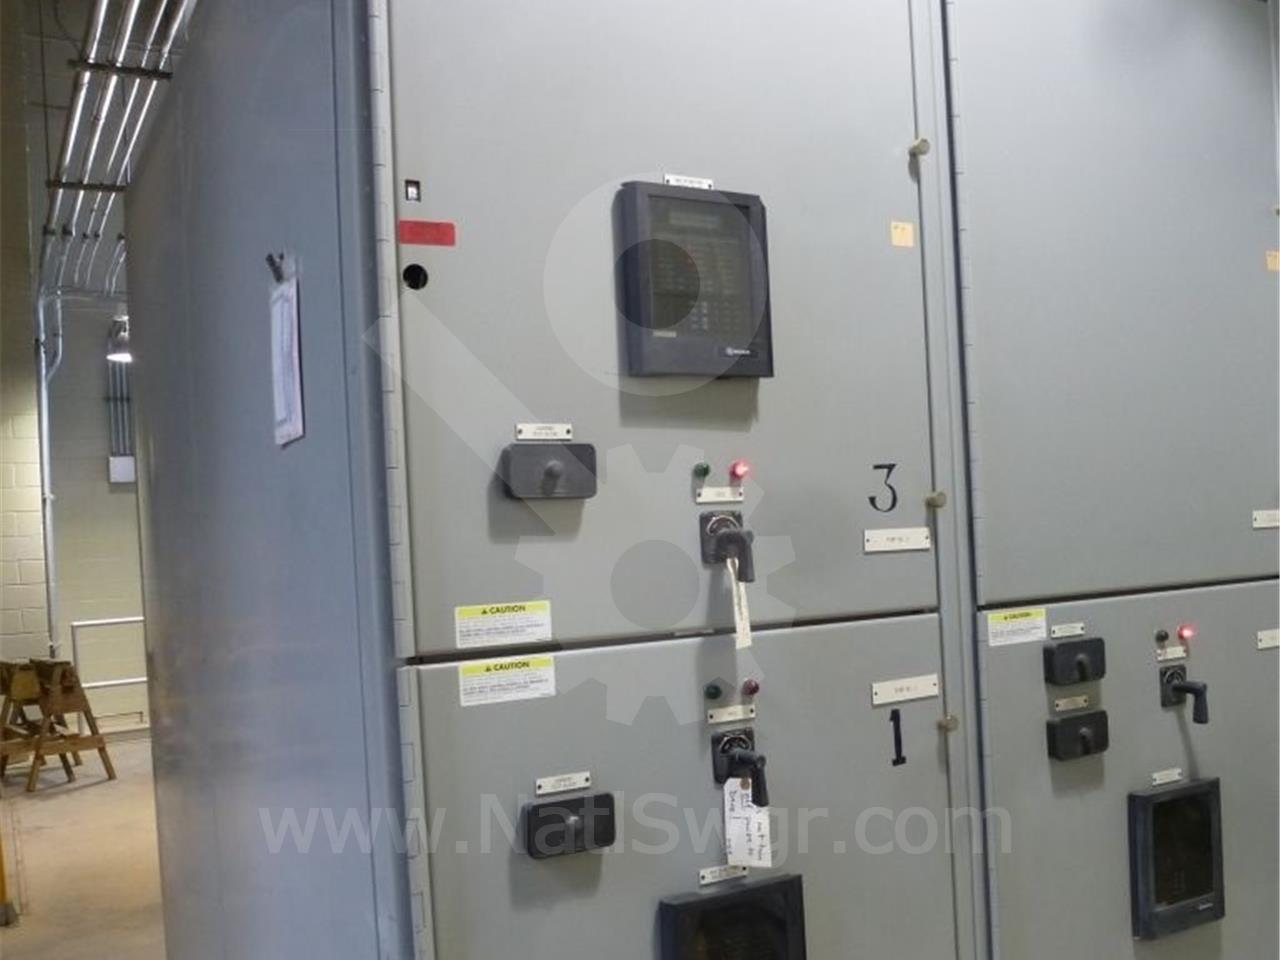 5KV GE / General Electric VB/VB1 INDOOR SWITCHGEAR 2-1200A BREAKER COMPARTMENTS, 240VAC CONTROL